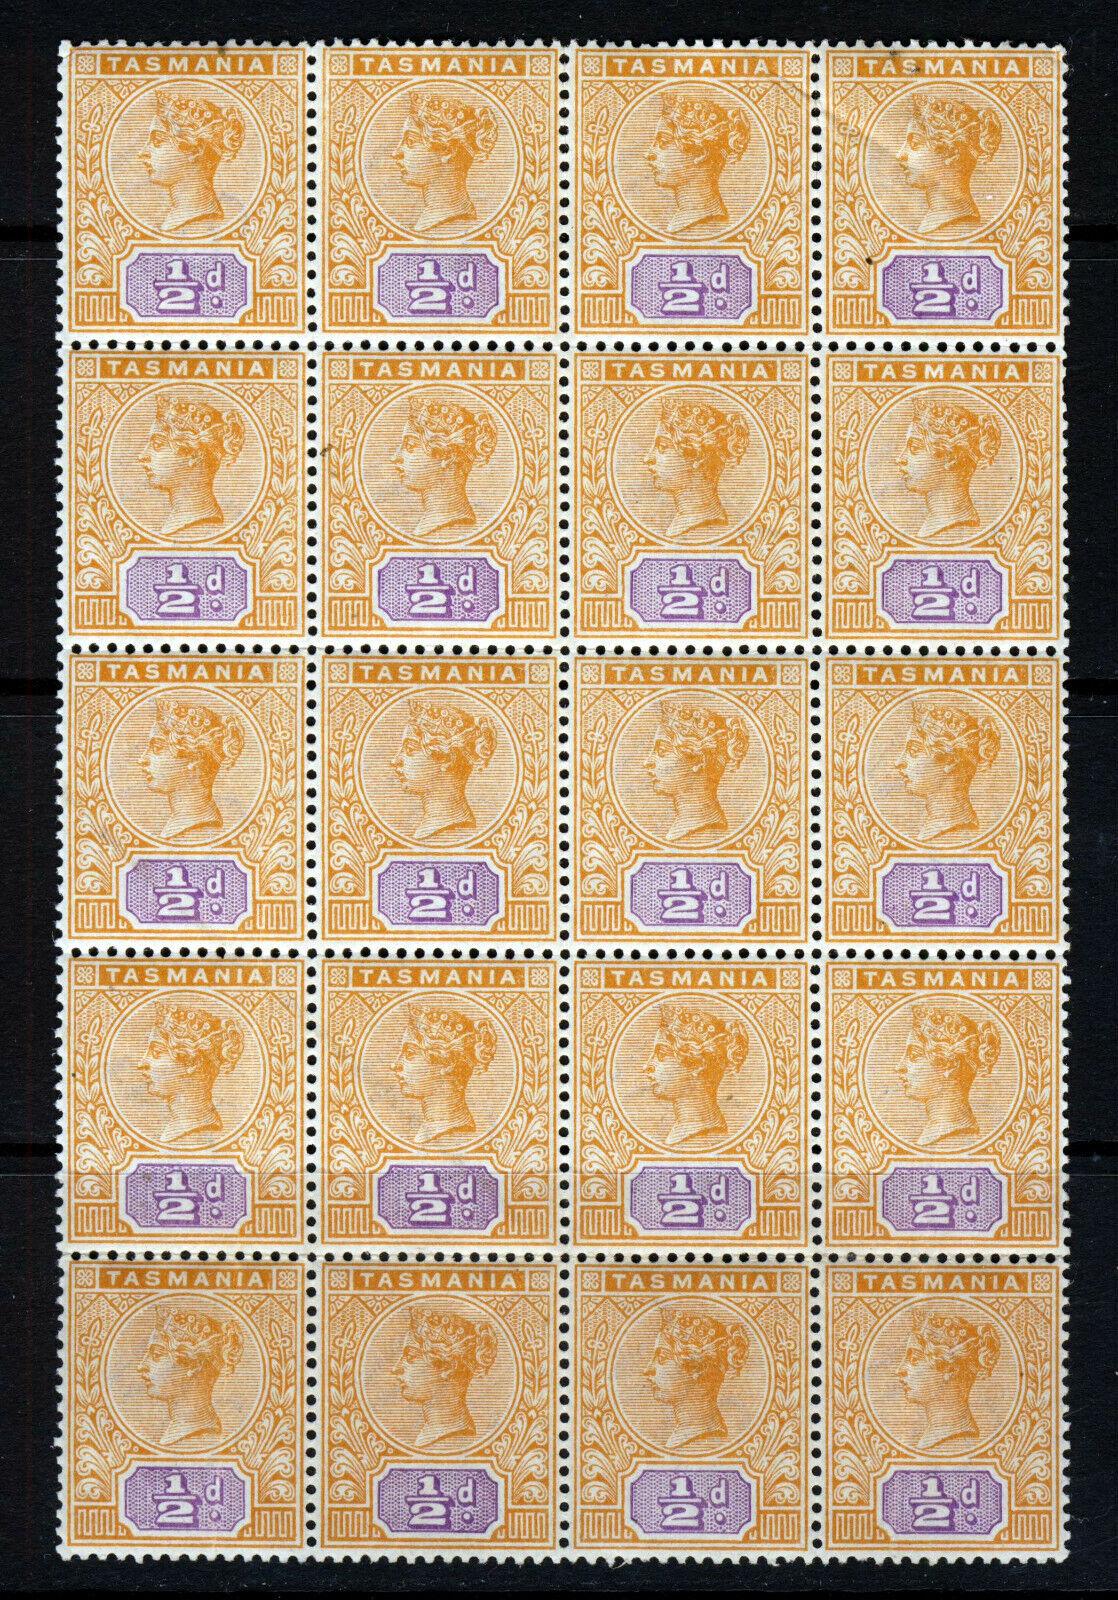 TASMANIA AUSTRALIA QV 1892 ½d. Orange & Mauve BLOCK OF TWENTY SG 216 MNH